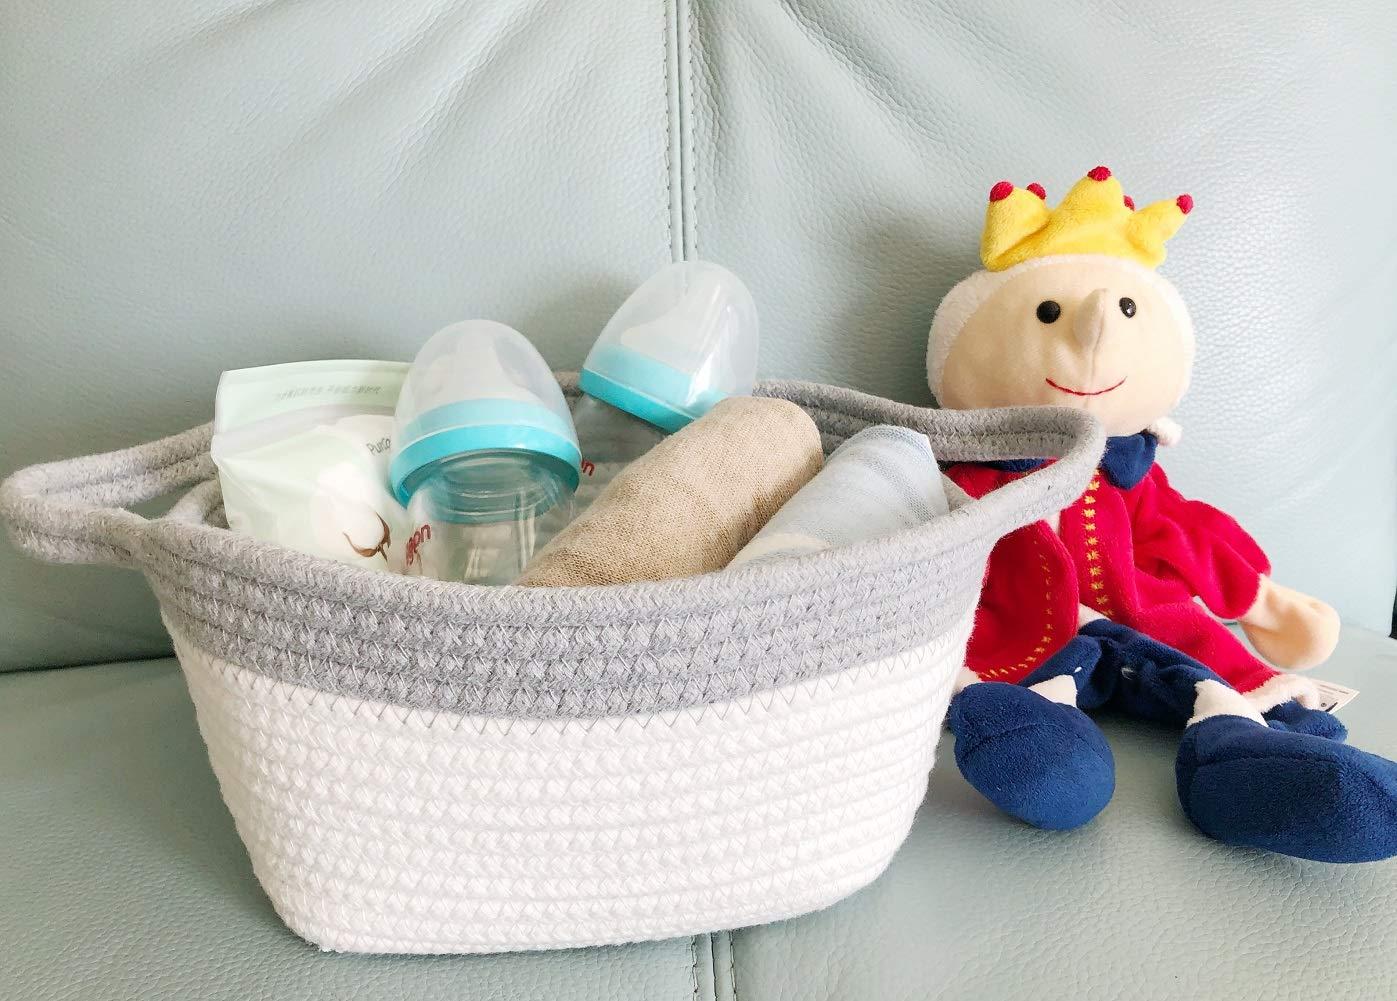 Home Decor-7.9 x 7.9 x 4 inches Snomy Small Woven Storage Basket-Square Cotton Rope Basket-Small Closet Storage Bins-Desk Basket Organizer for Baby Toys Pet Toys,Keys